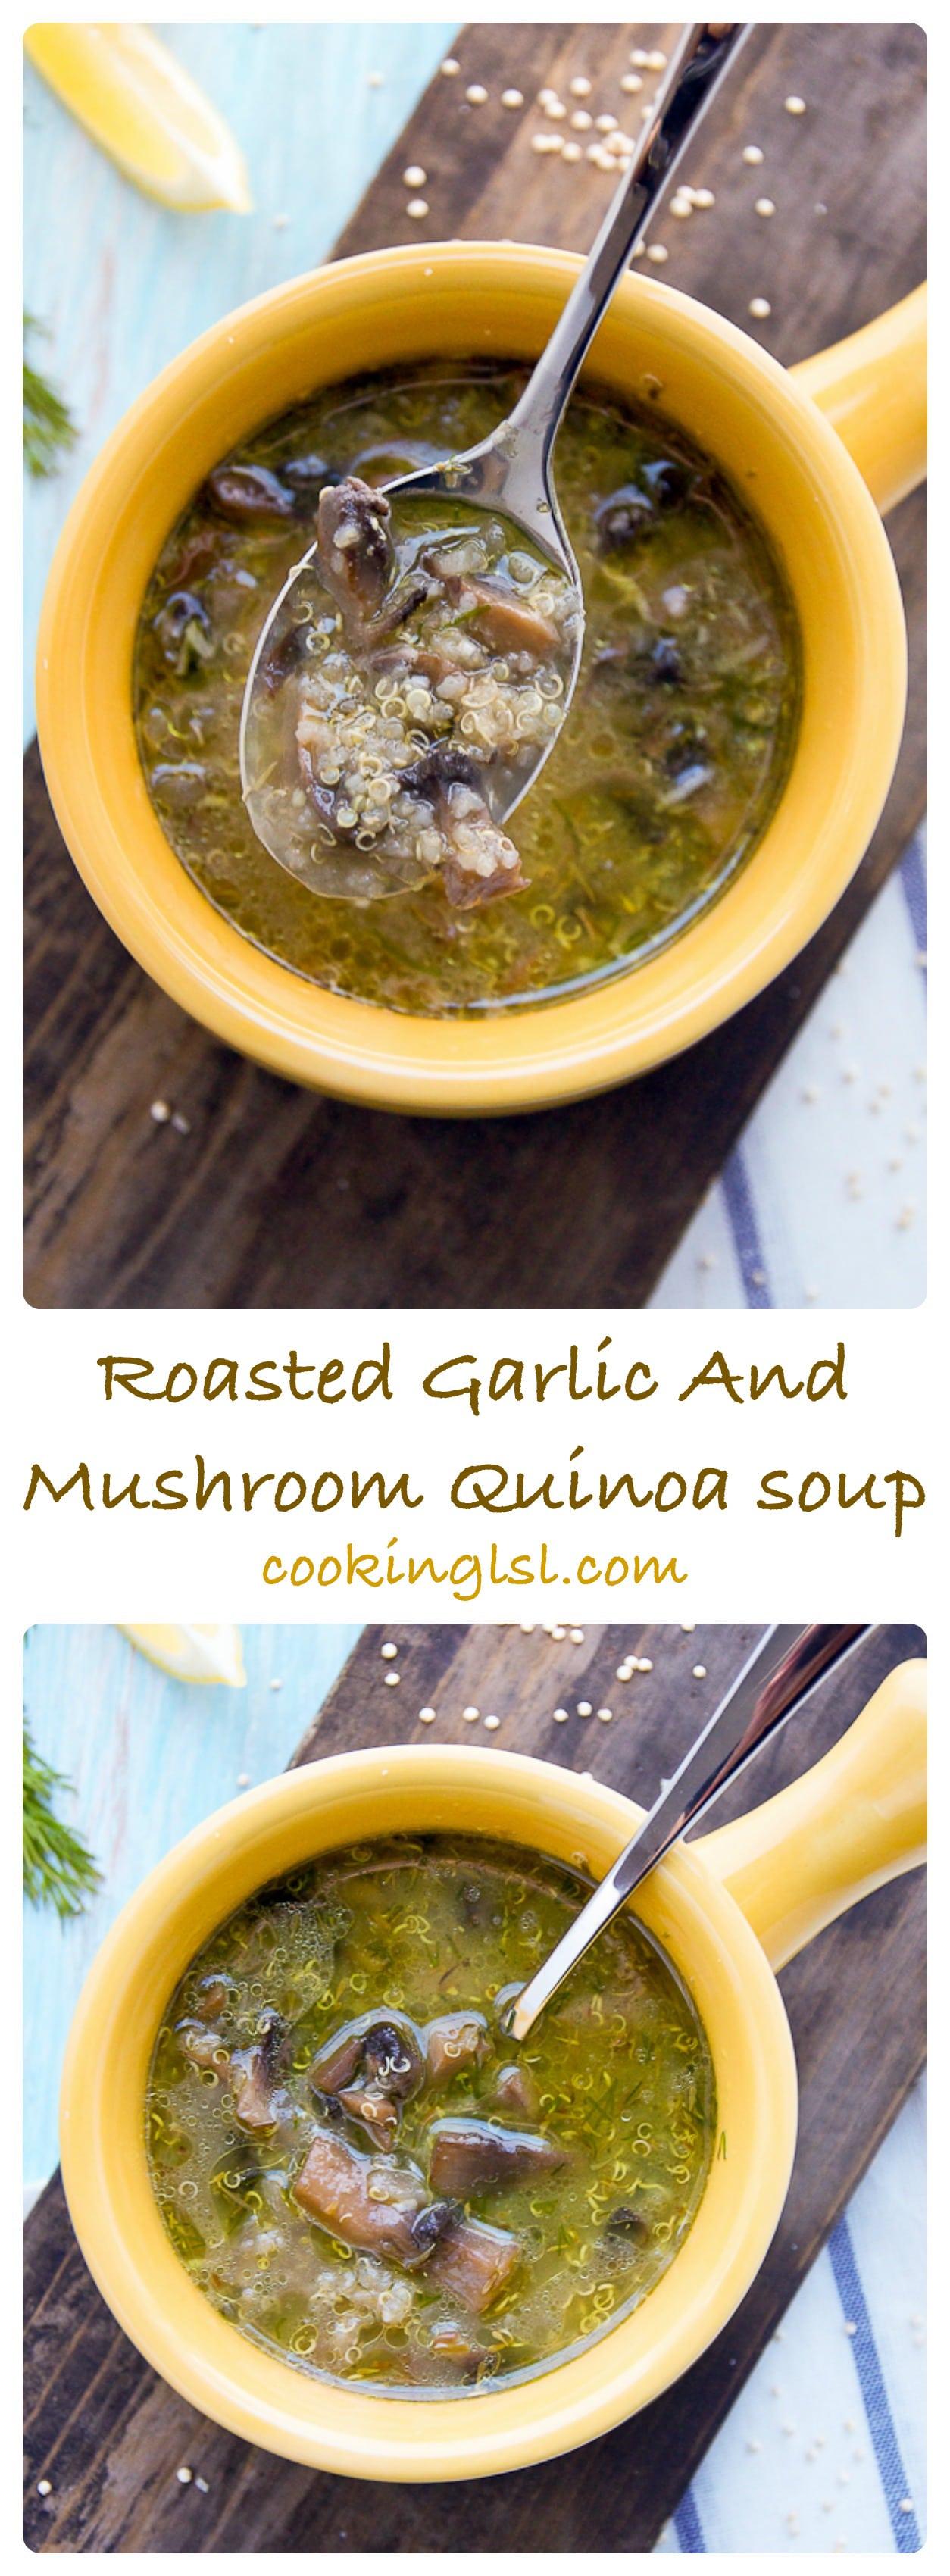 Roasted-garlic-mushroom-quinoa-soup